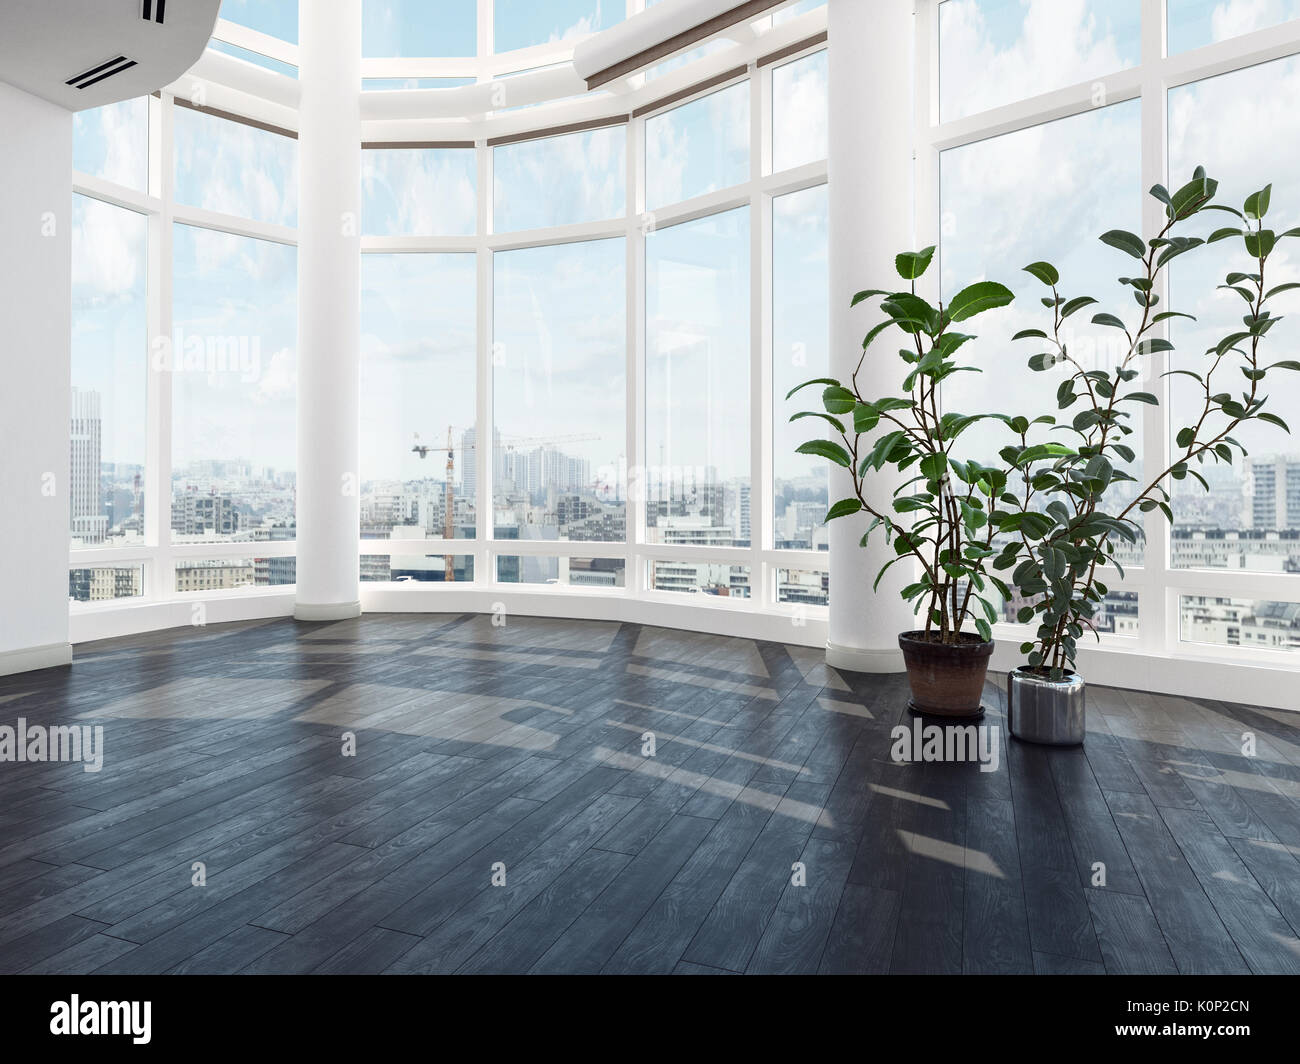 Fußboden Modern English ~ Leer leer stehenden modernen luxus apartment oder penthouse